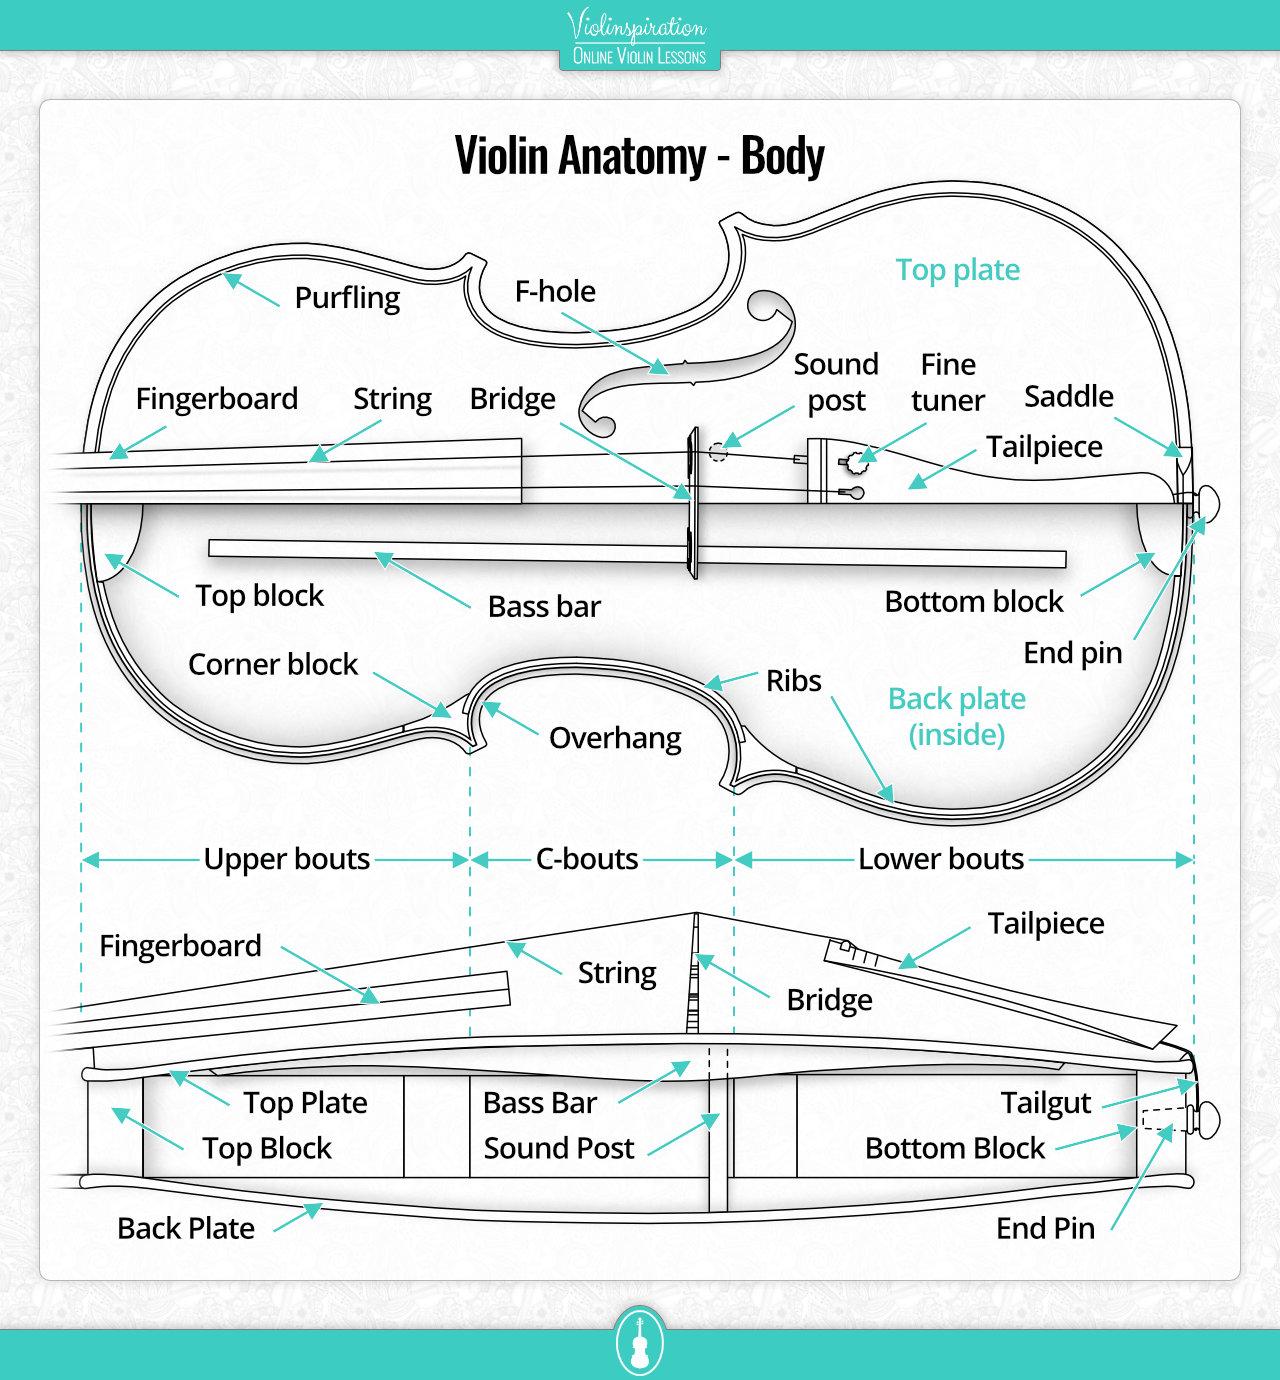 Violin Anatomy - Body